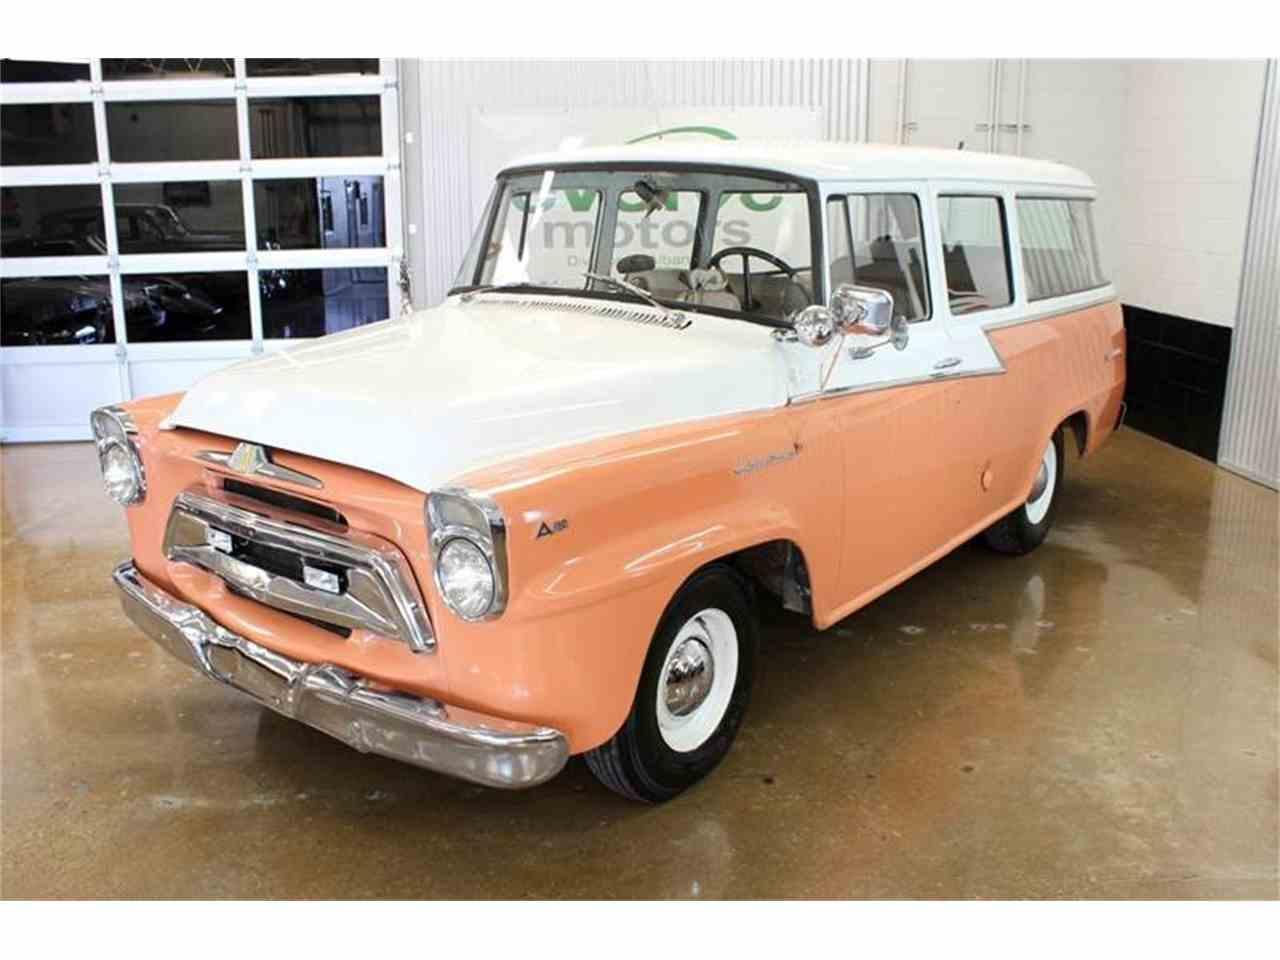 1959 International Travelall for Sale - CC-1035687